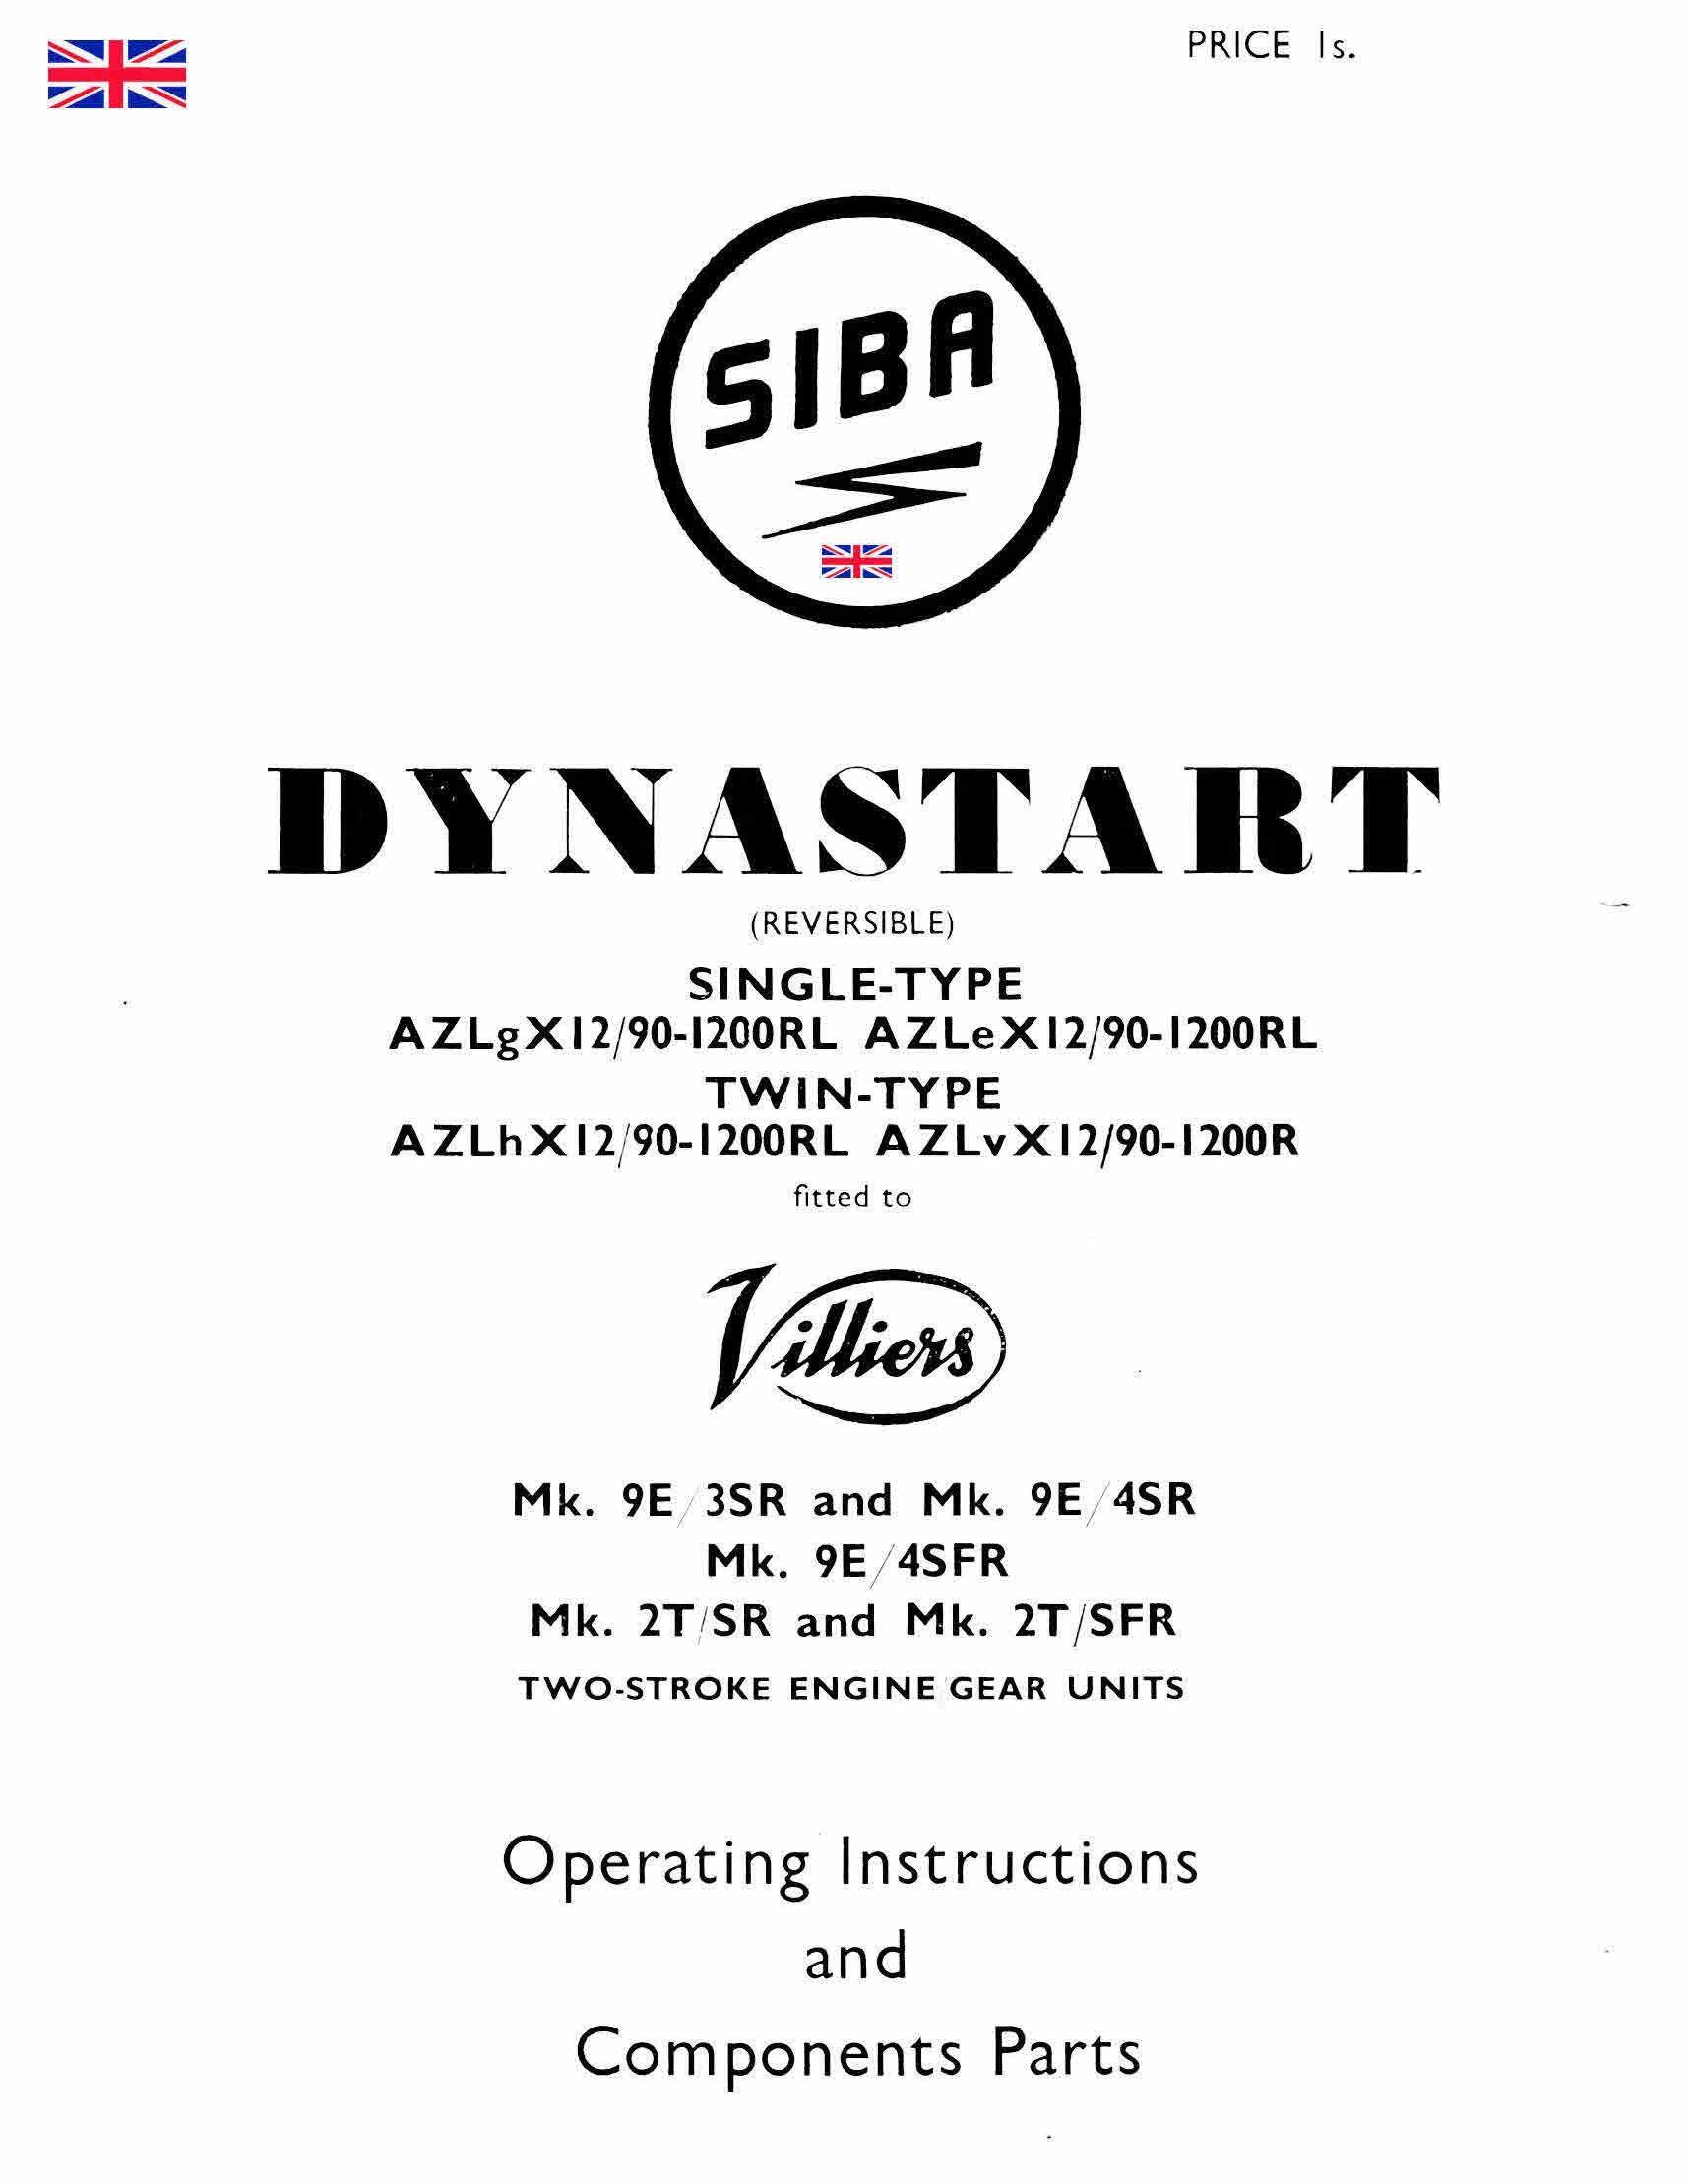 ea93d038dddcce31dab0540e4eb311b3 villiers siba dynastart manuals for mechanics dynastart wiring diagram at gsmportal.co